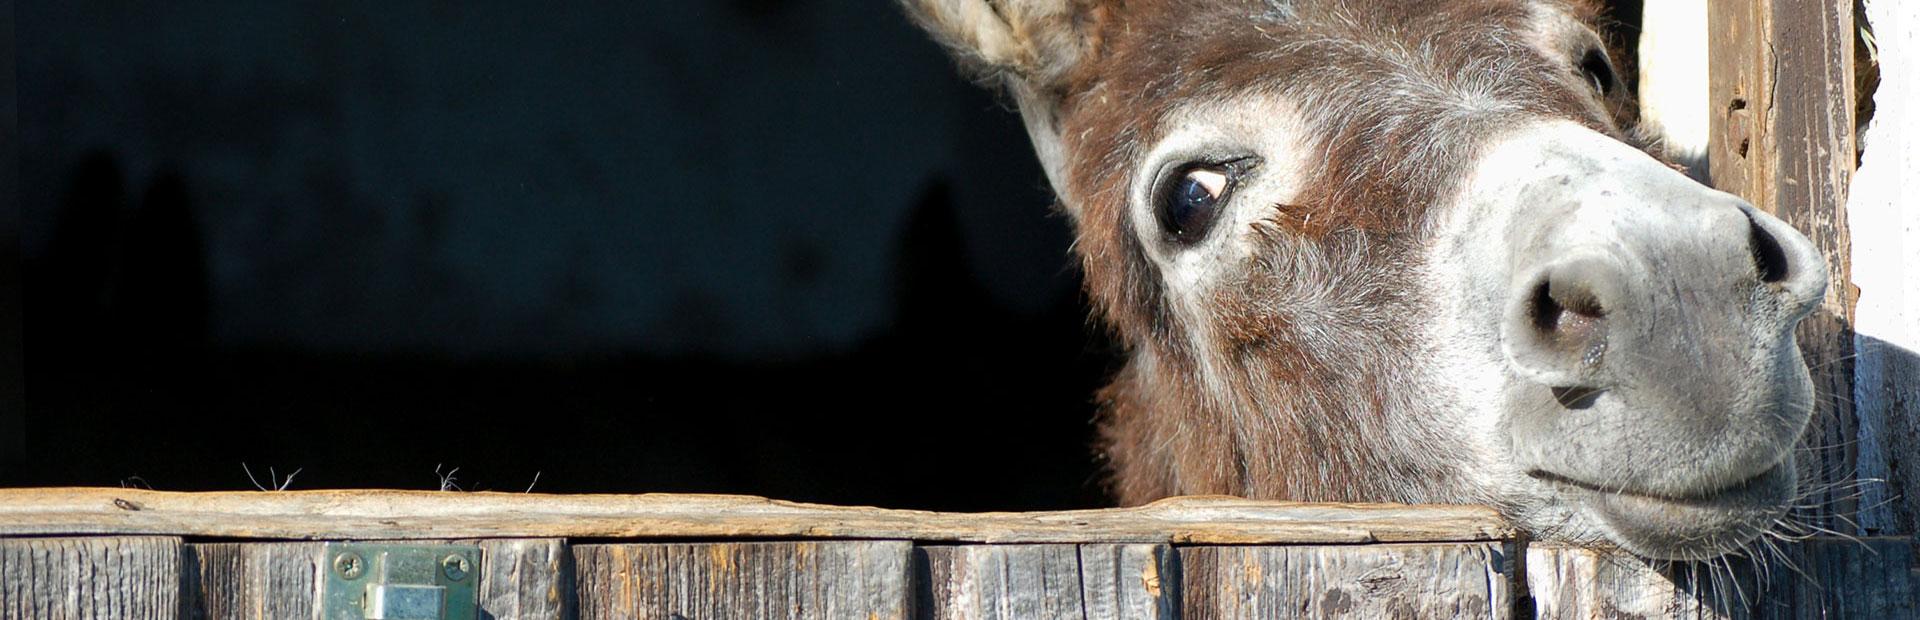 donkey-header-banner